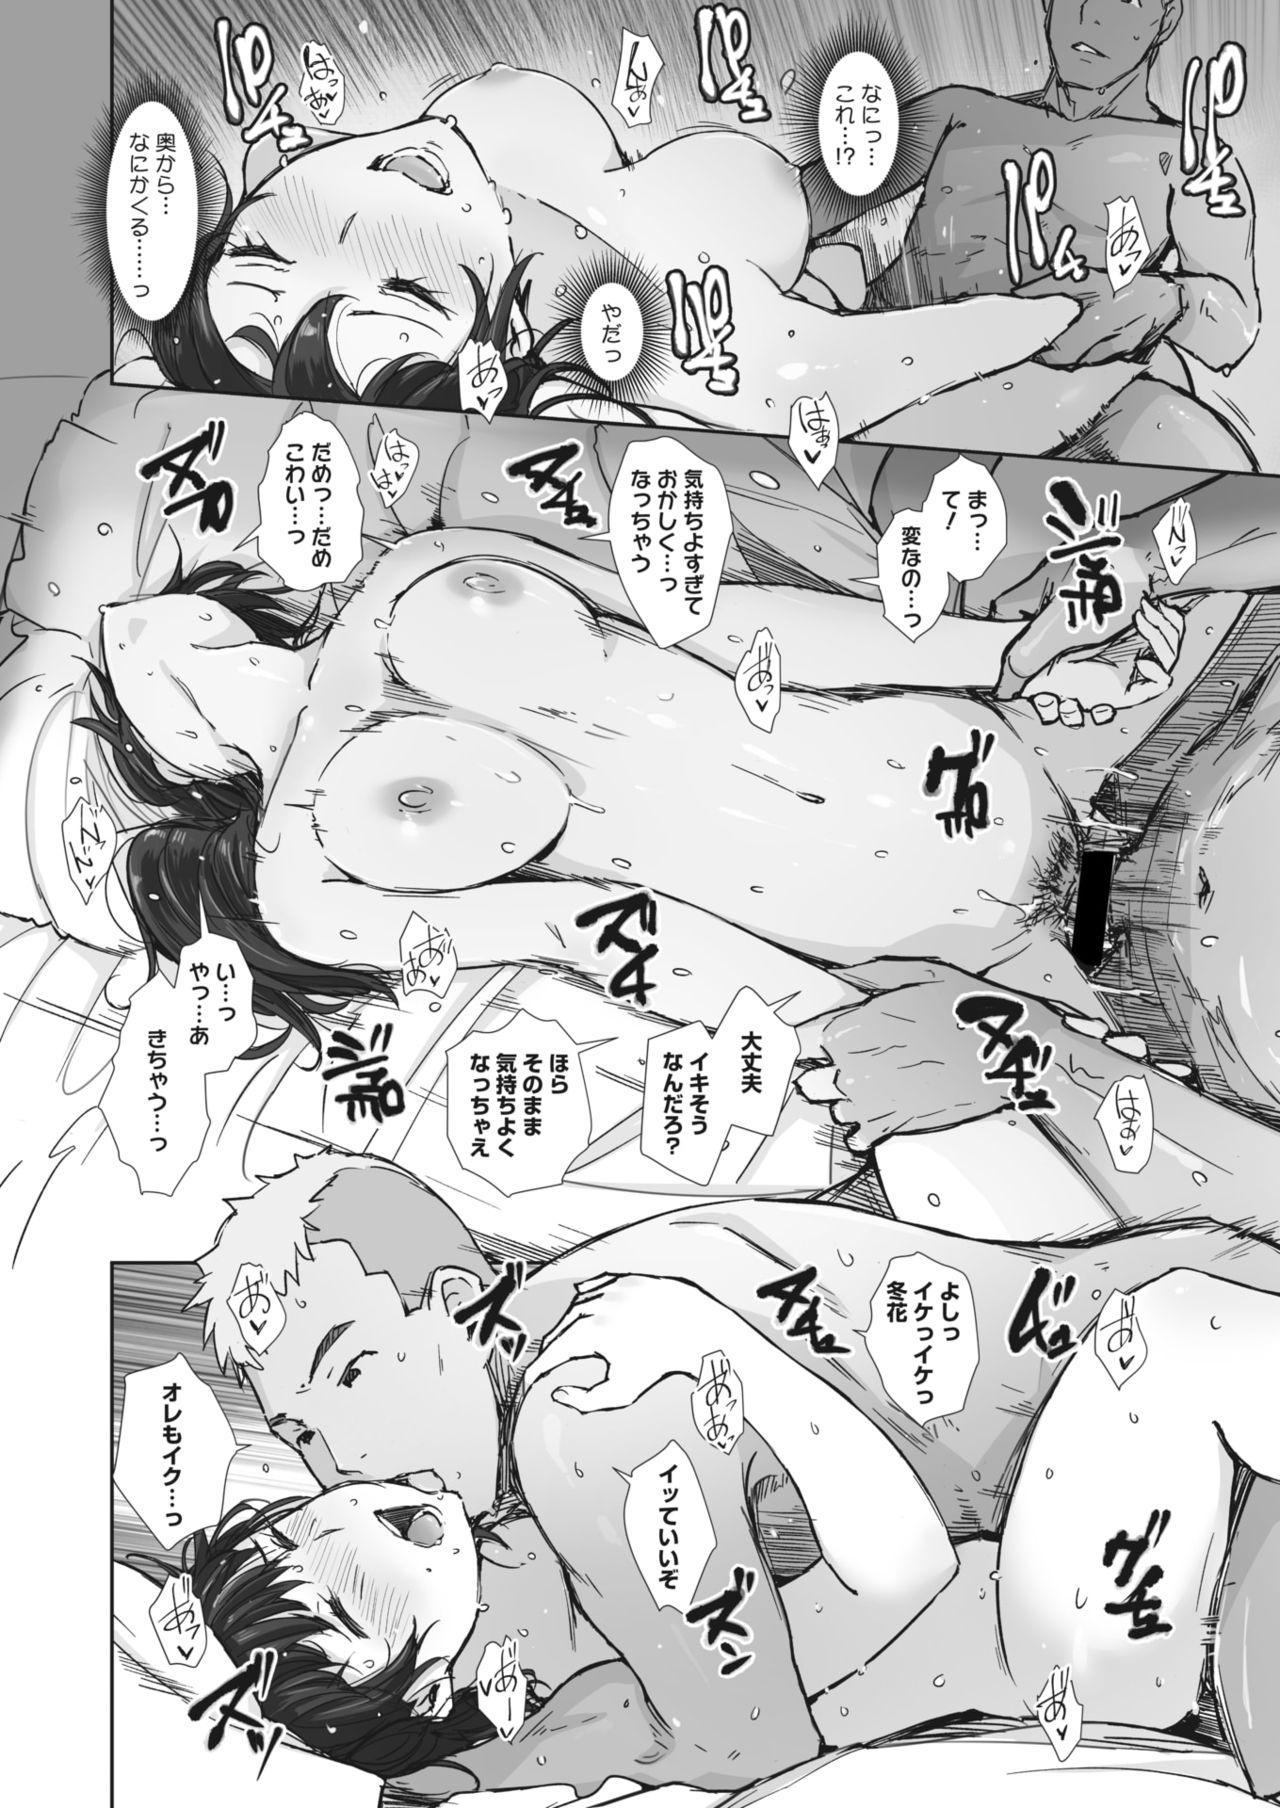 COMIC HOTMiLK Koime Vol. 25 48